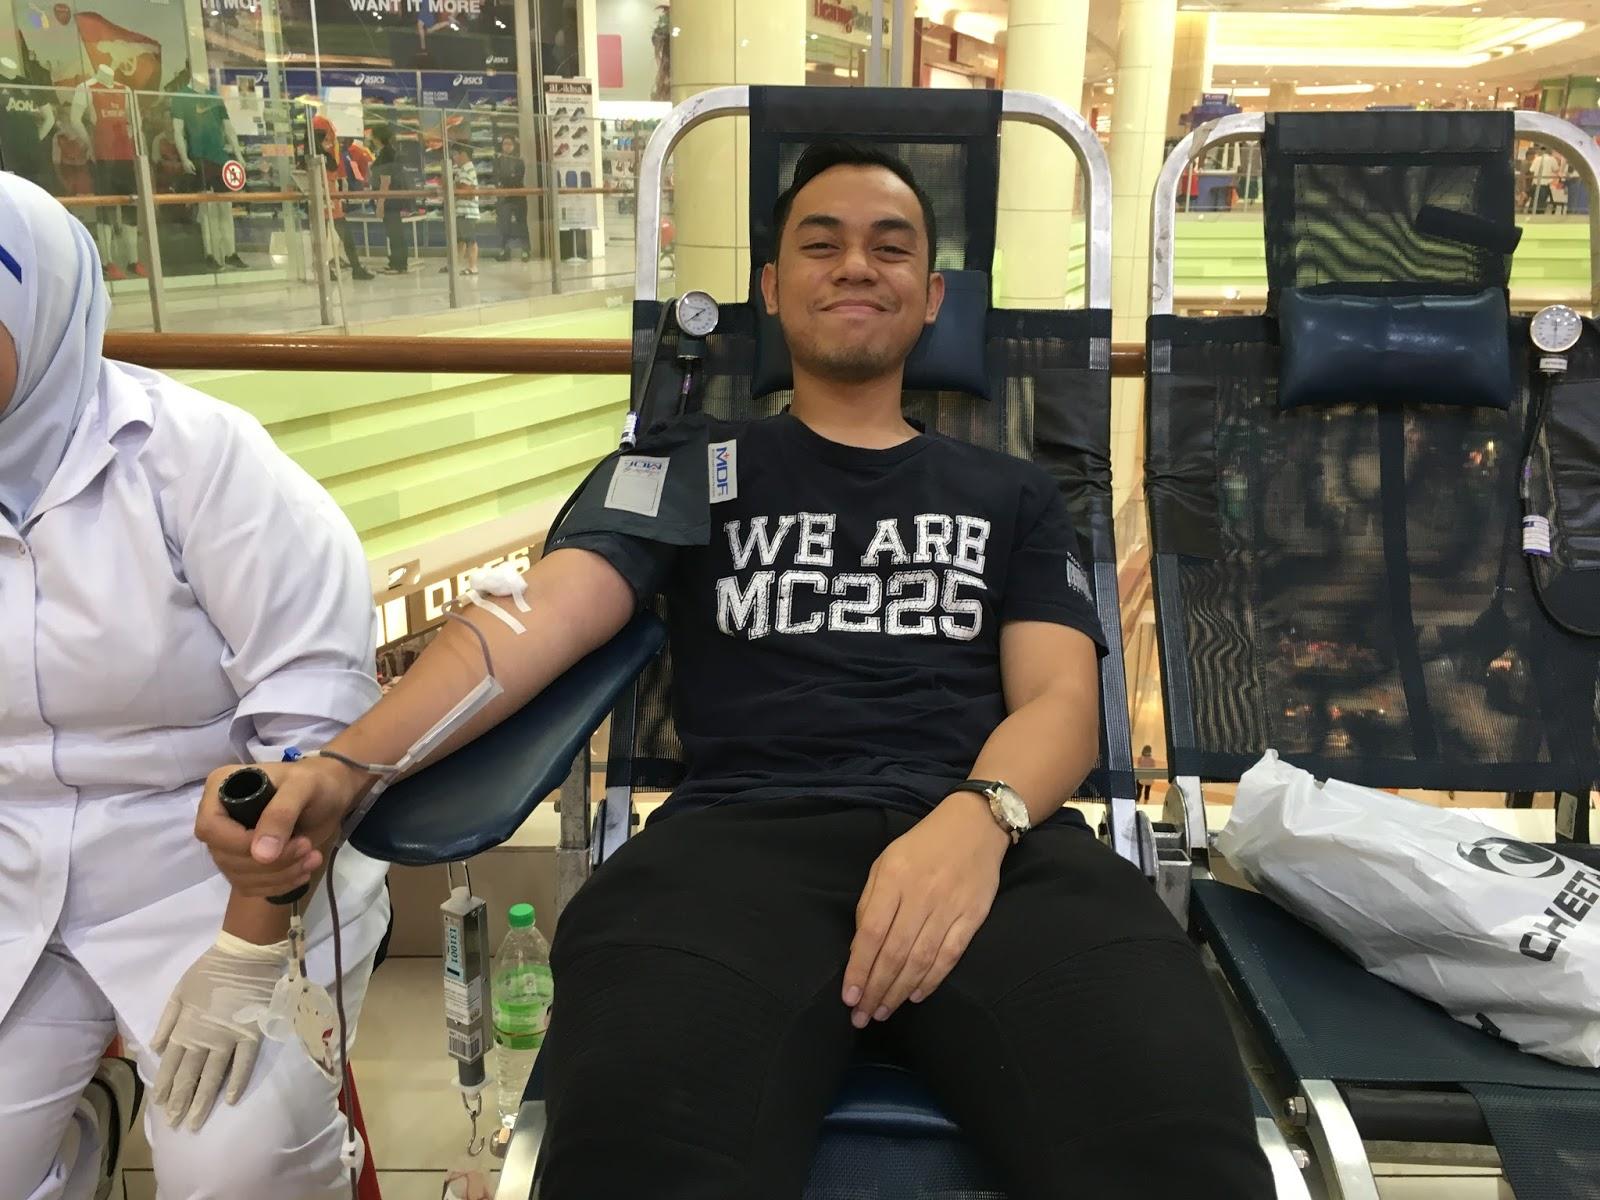 Derma Darah : Tak 'sado' lah kalau takut jarum